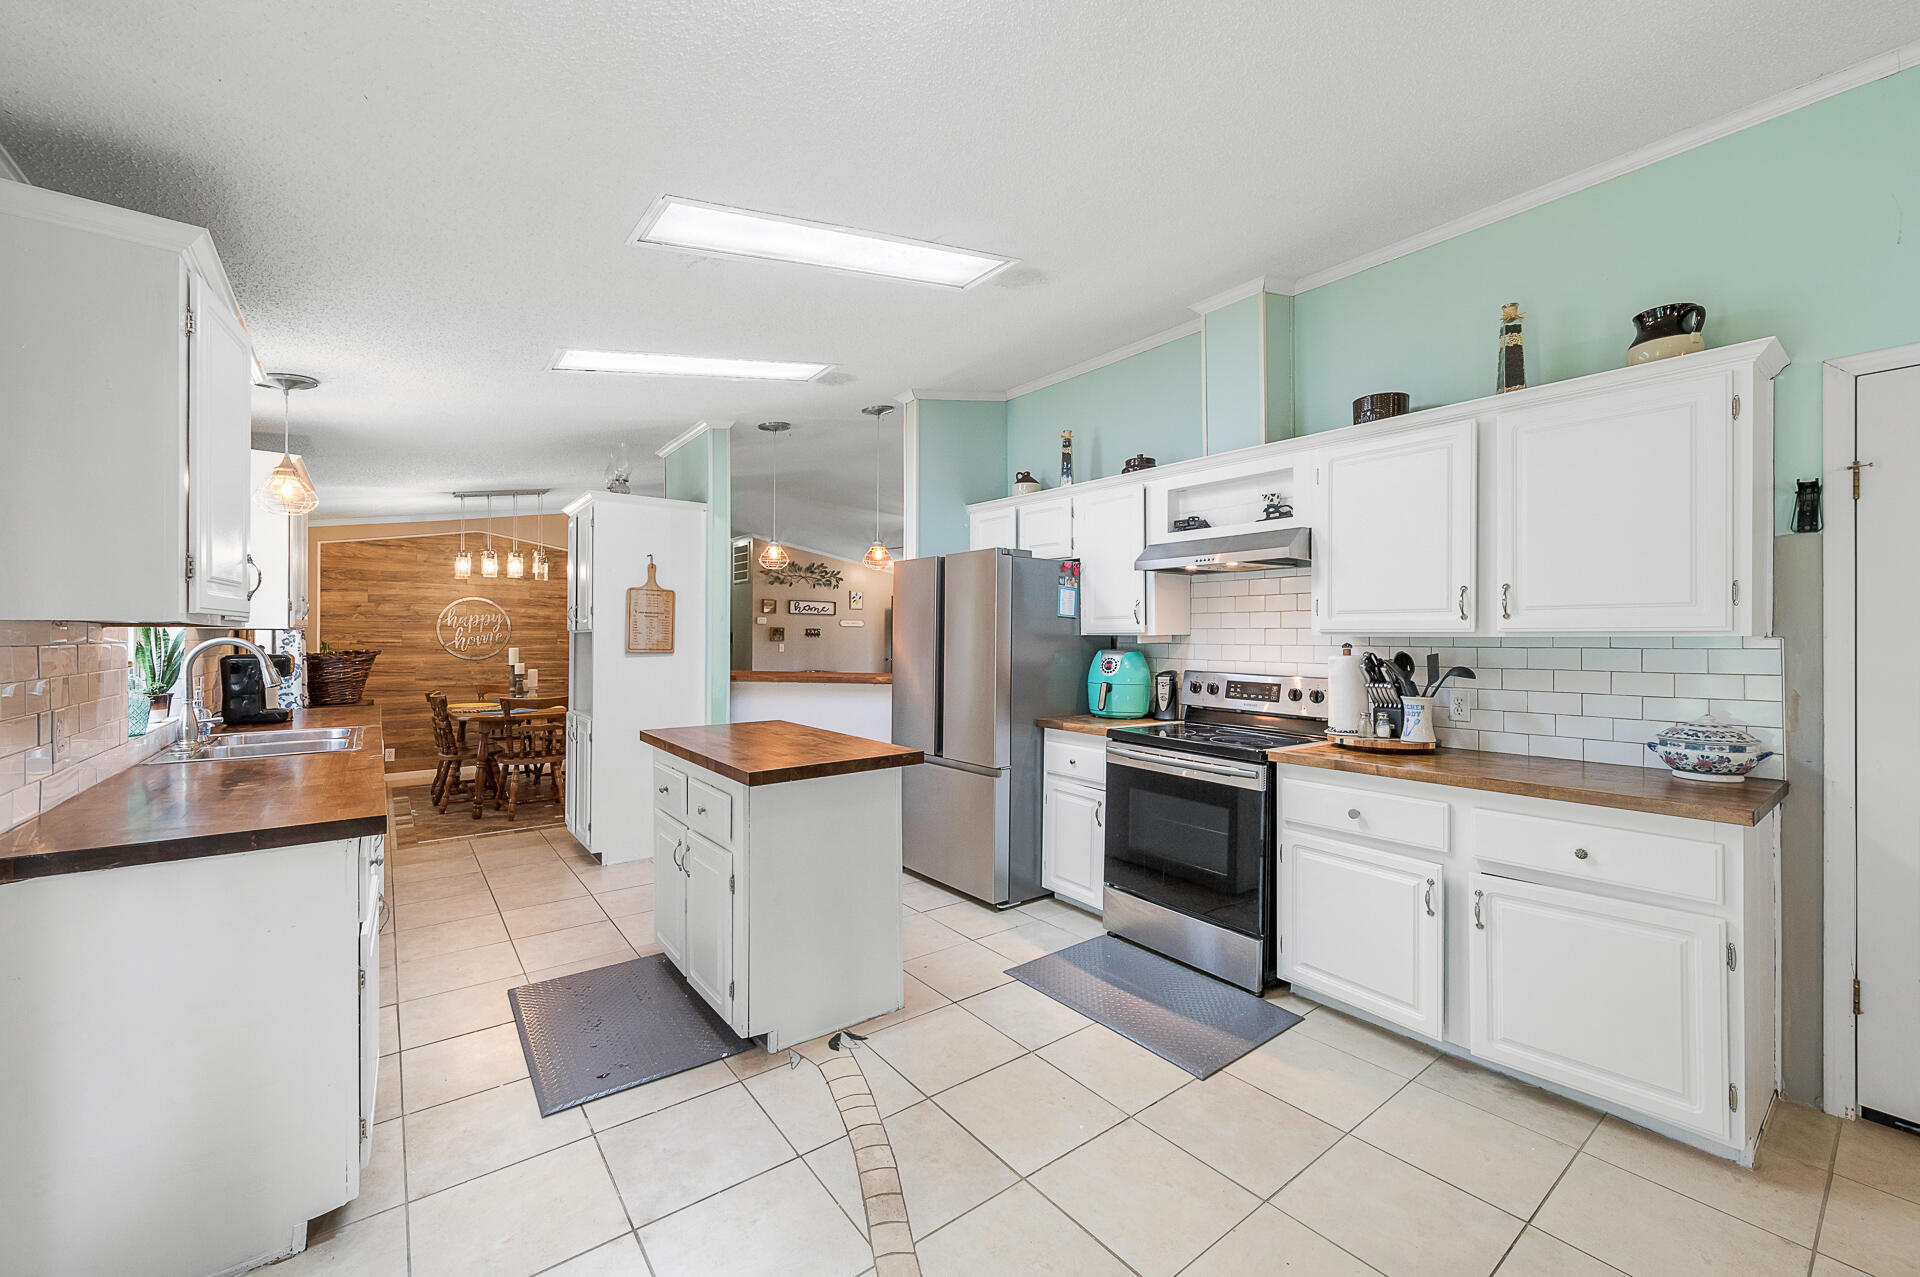 Clemson Terrace Homes For Sale - 250 Medina, Summerville, SC - 27